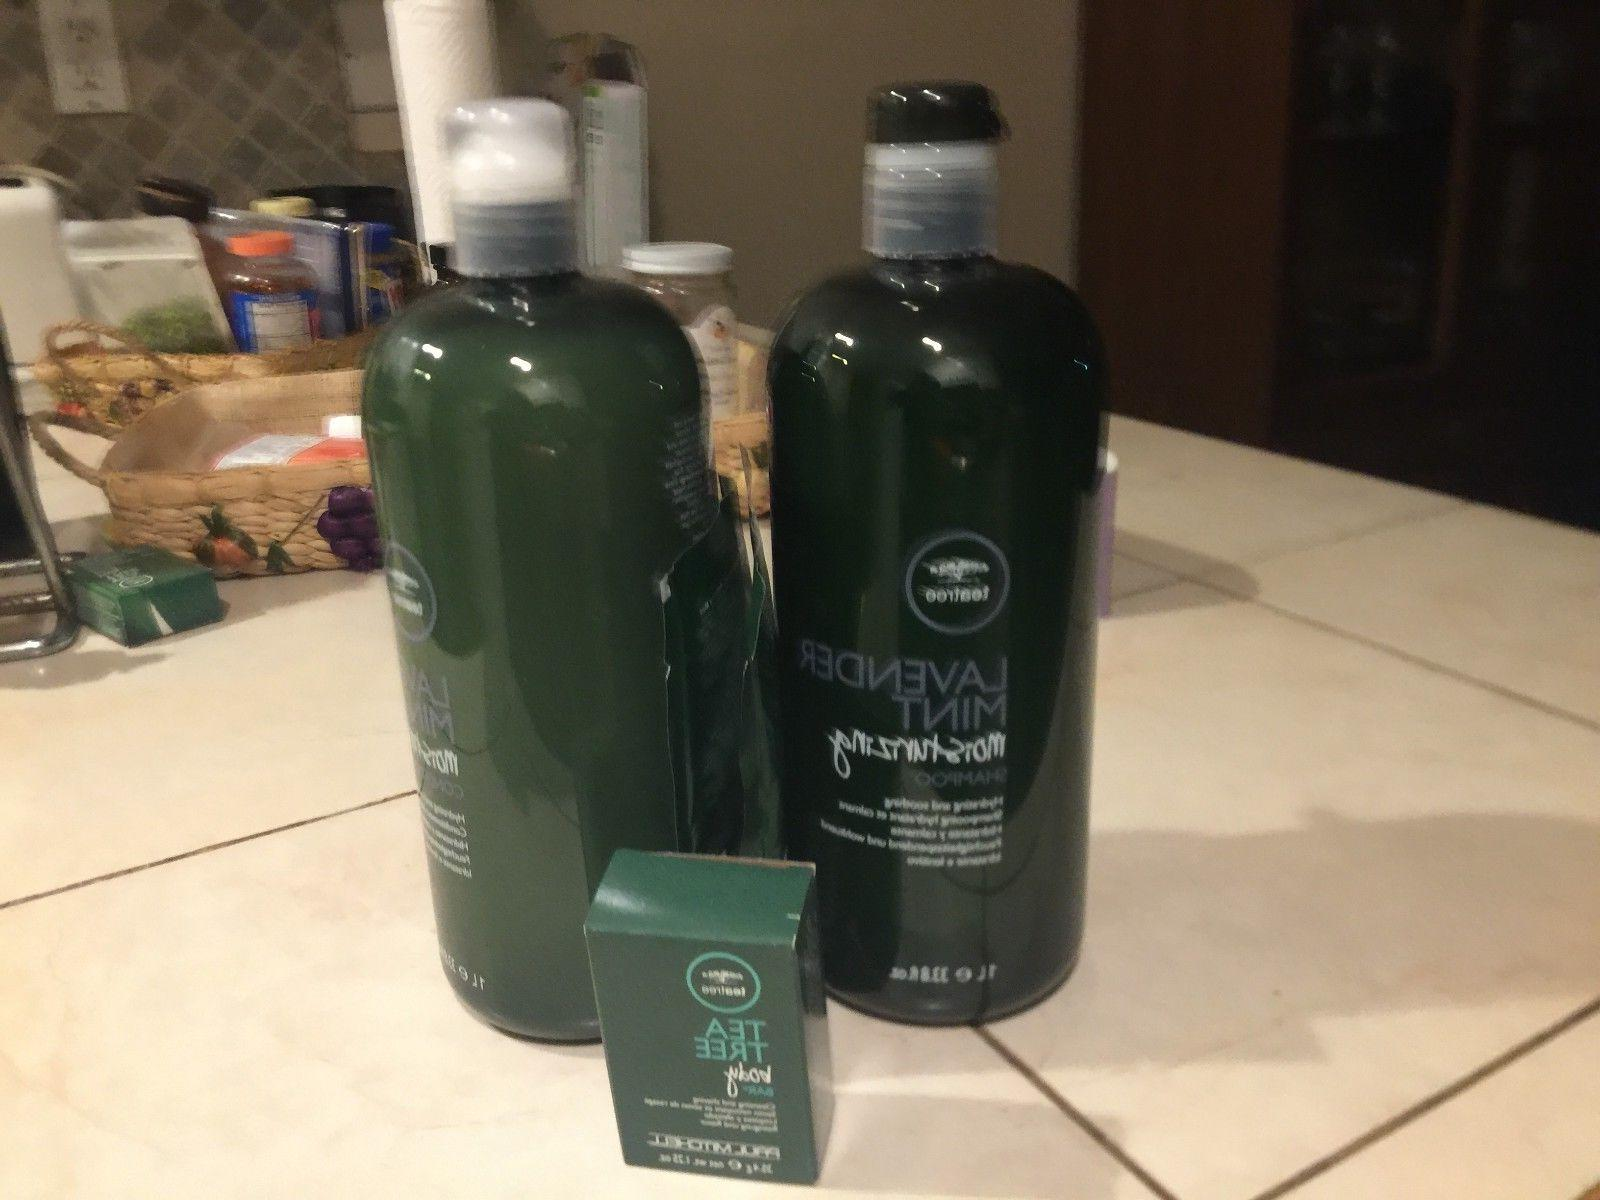 tea tree lavender mint shampoo and conditioner